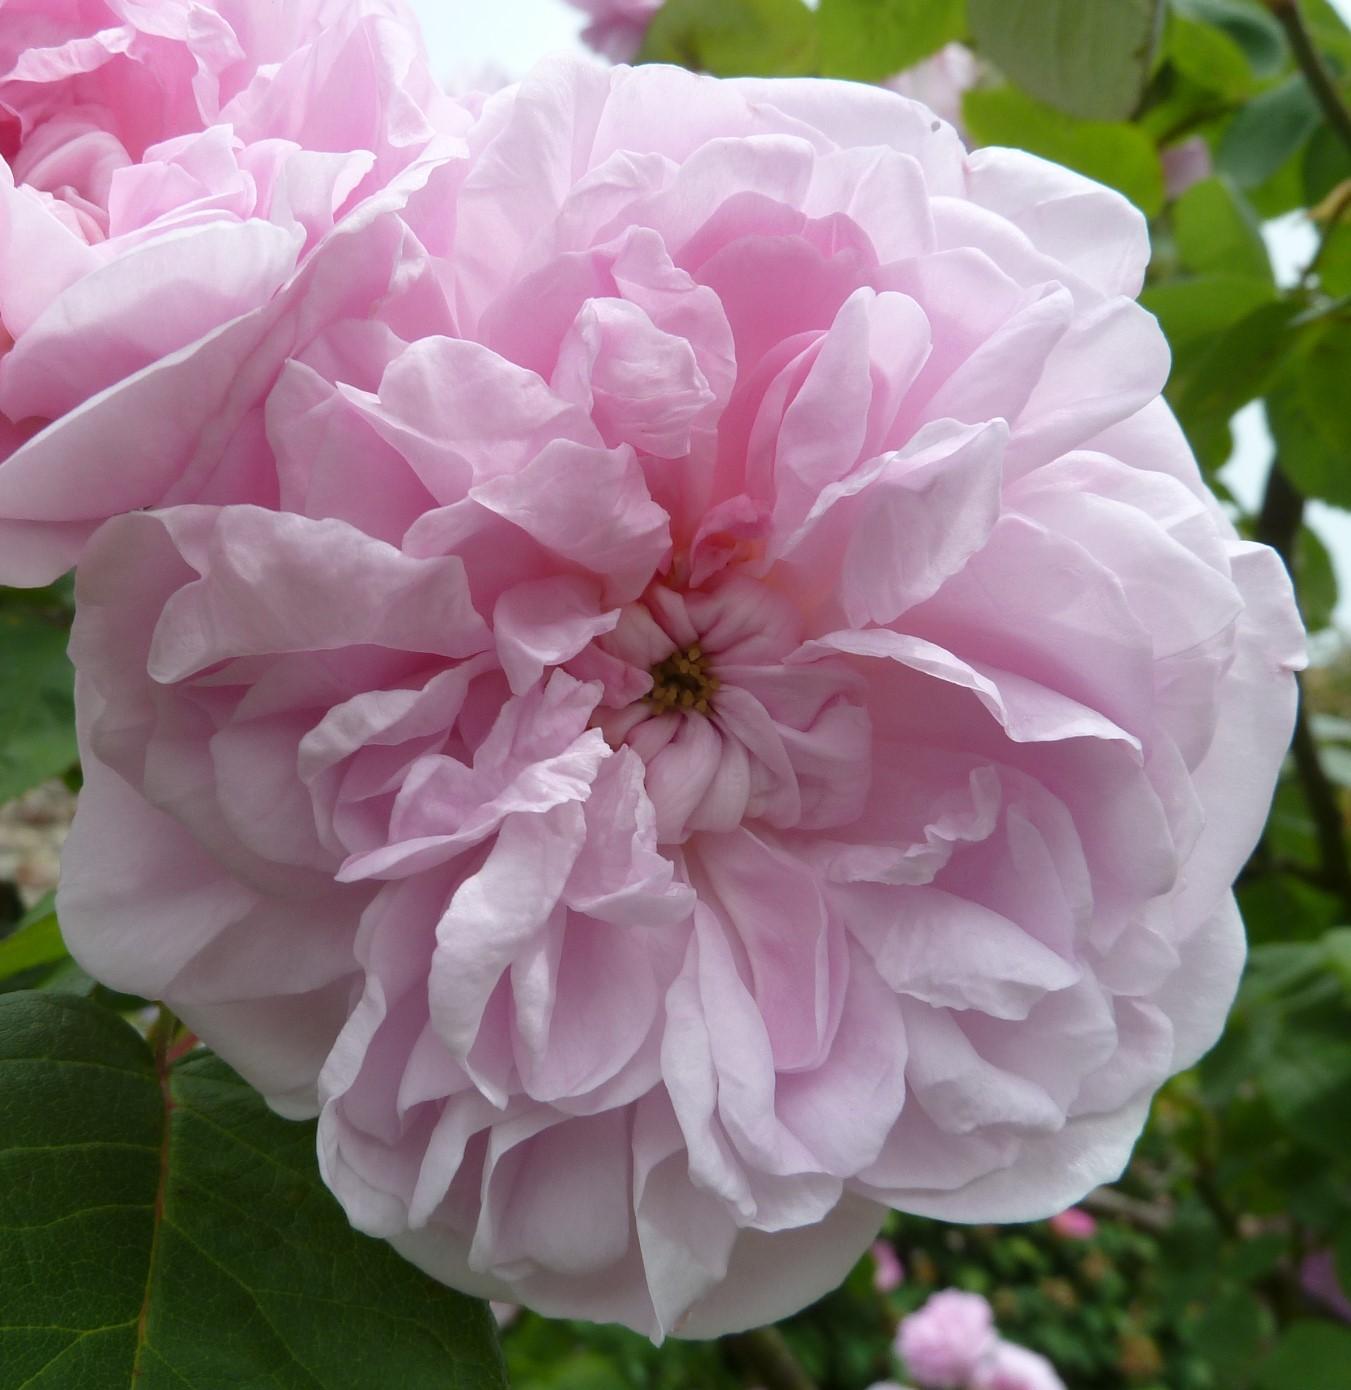 roses are blooming part 2 sissinghurst garden. Black Bedroom Furniture Sets. Home Design Ideas